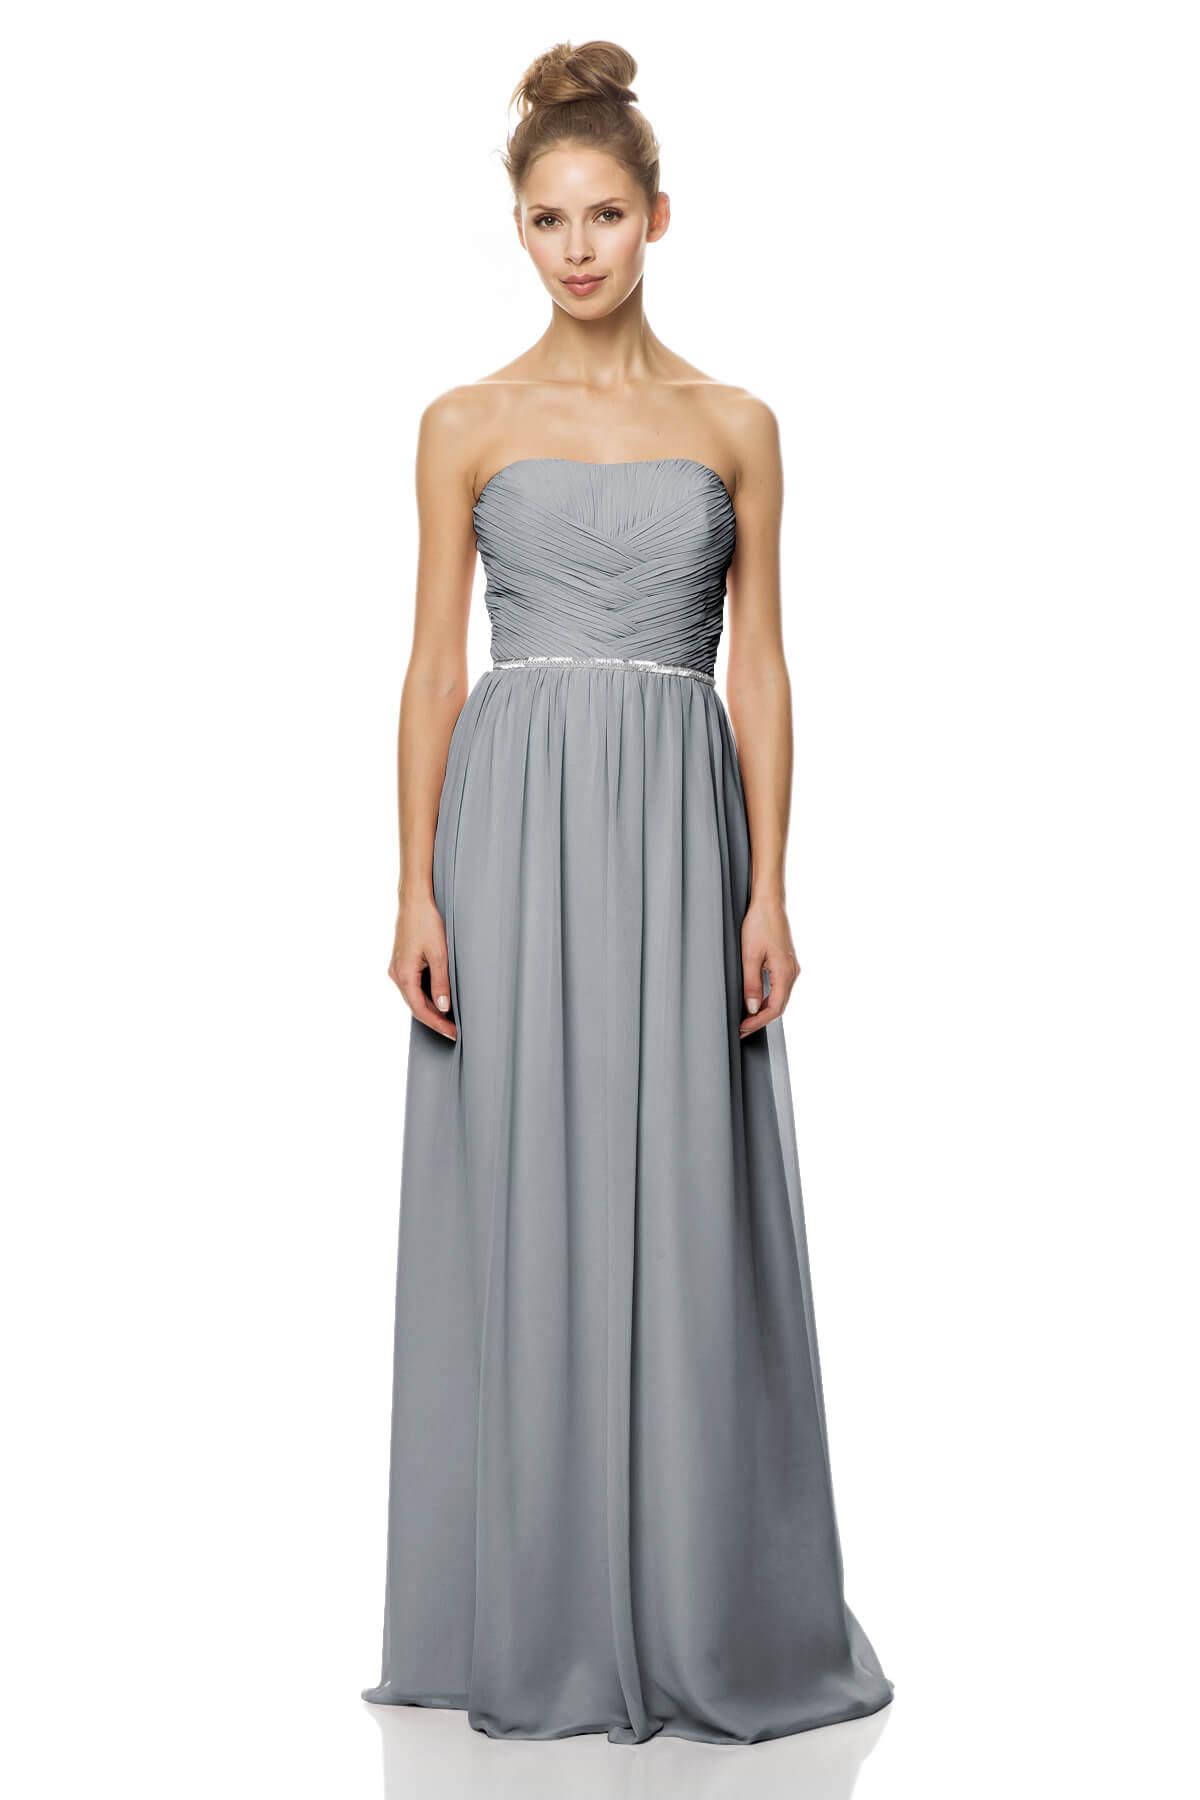 Bari jay bridesmaids bridesmaid dresses prom dresses formal bridesmaids dress style bc 1500 quick ship select options ombrellifo Images